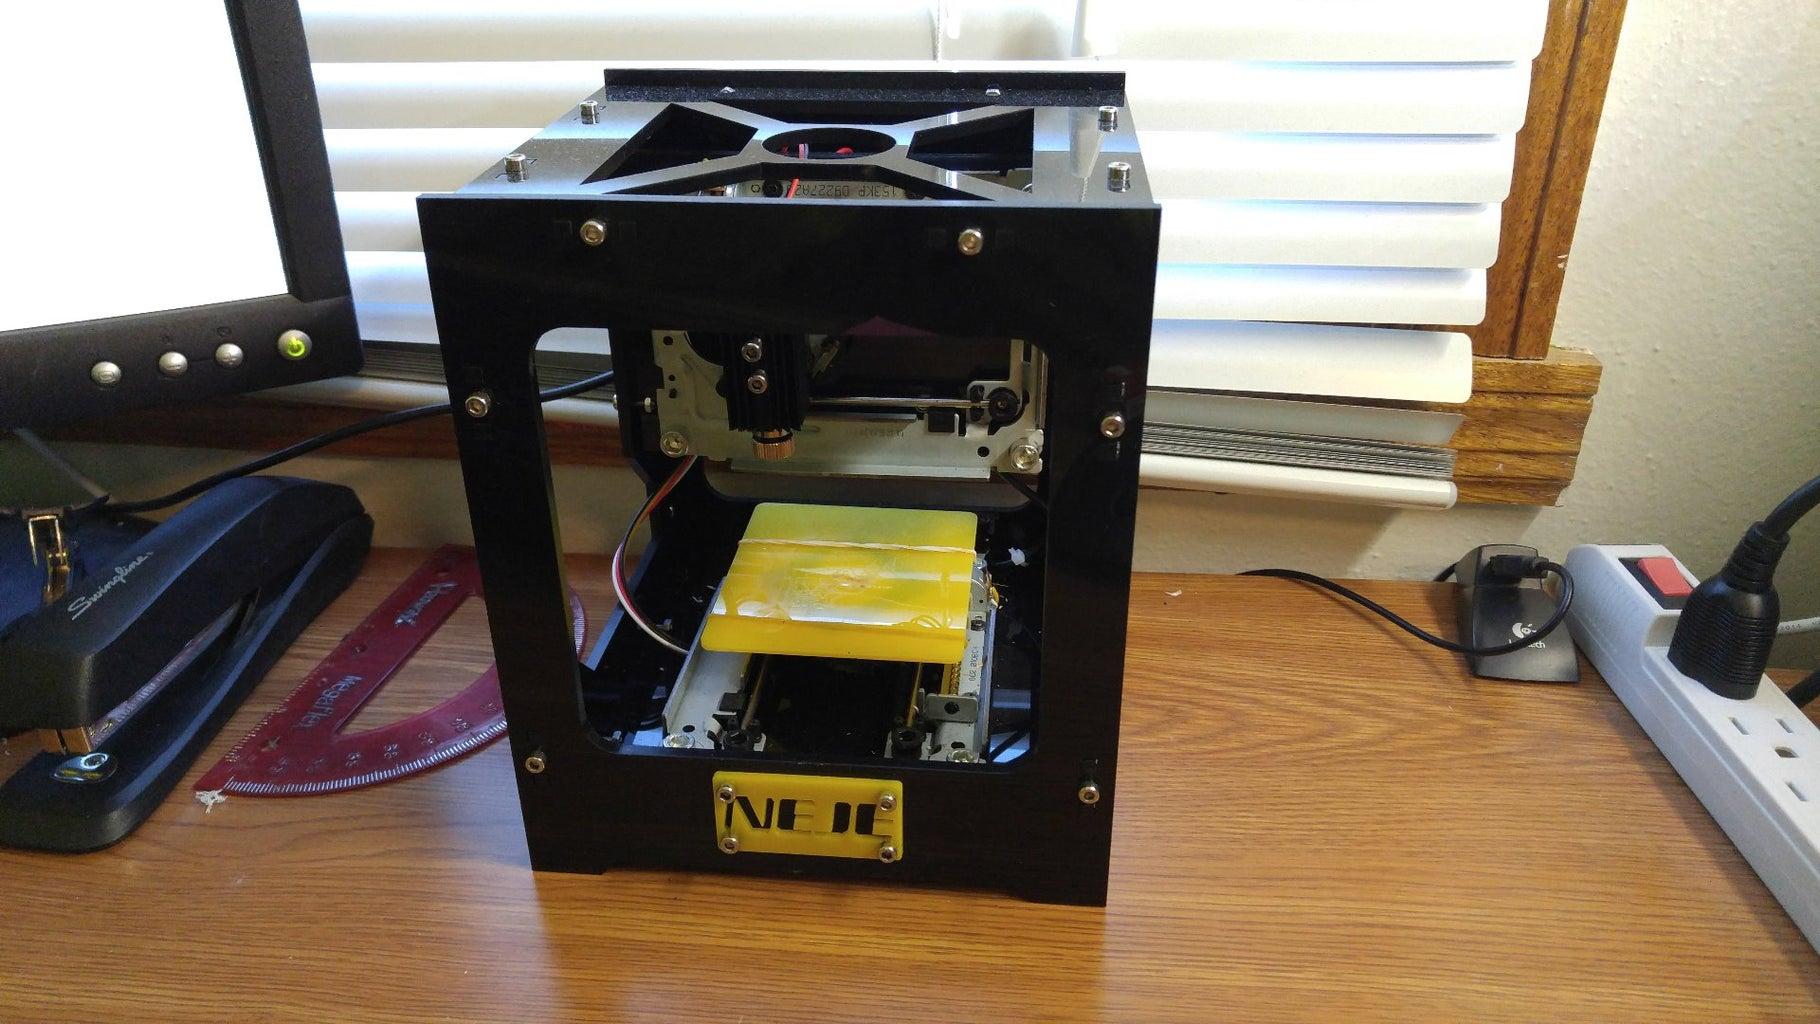 Hardware (The Engraver) Set Up